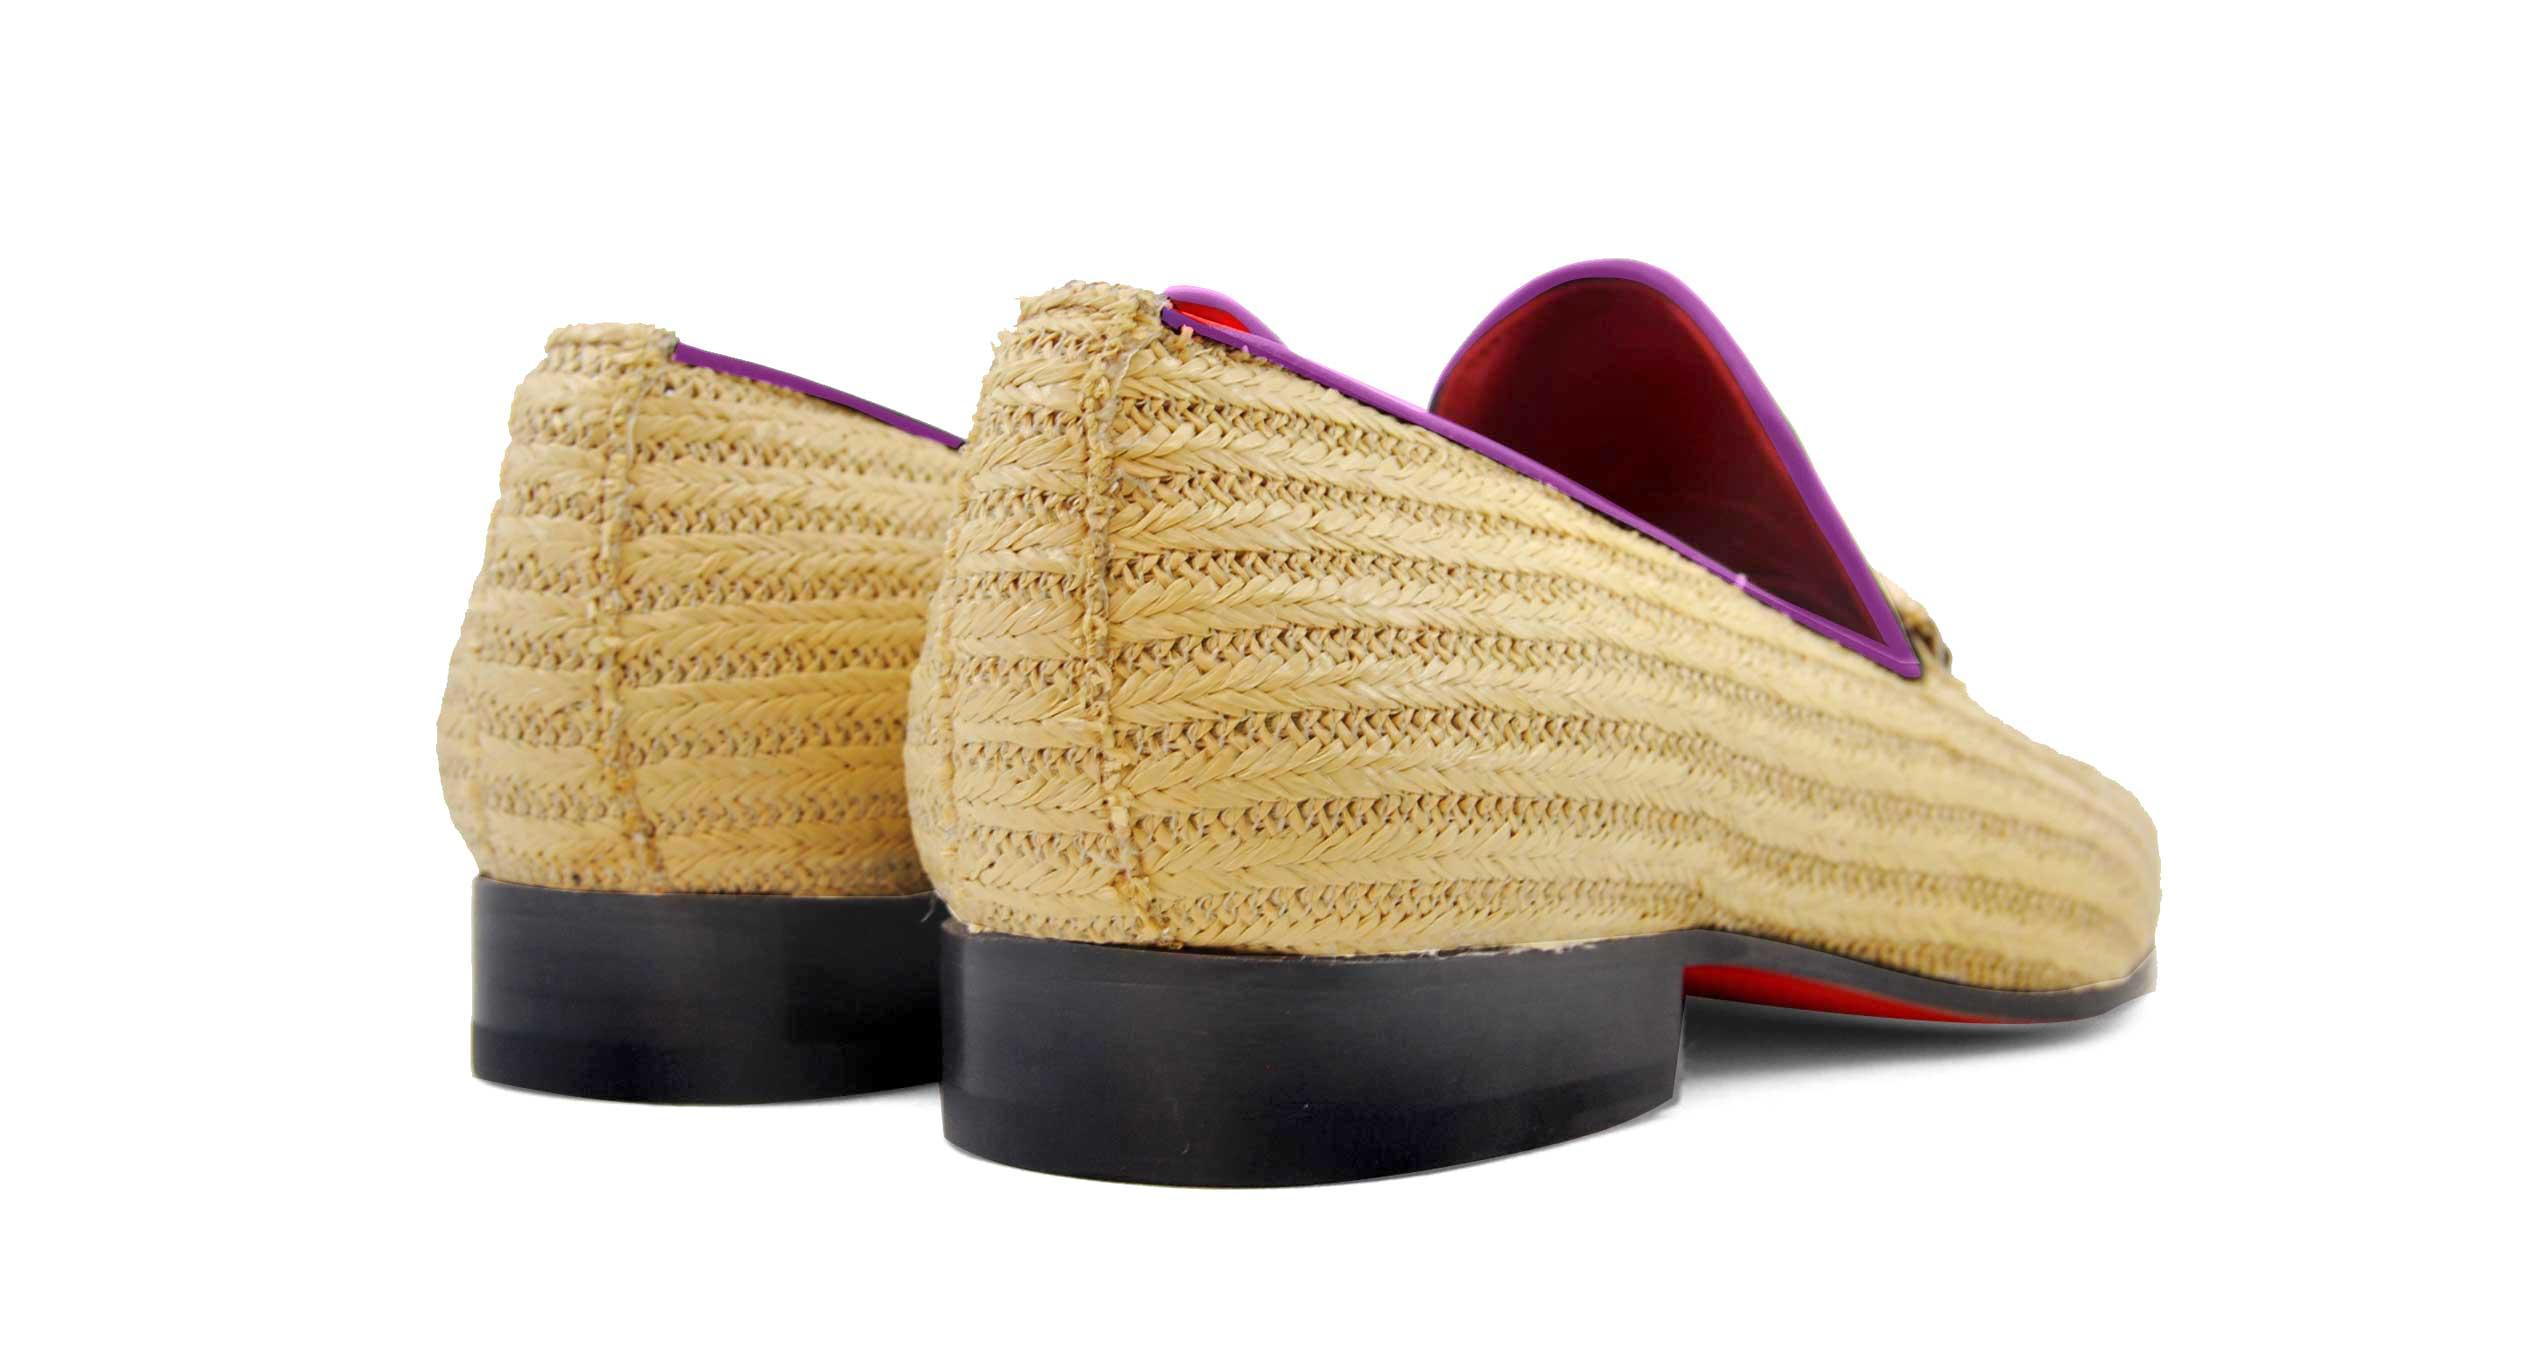 Foto 4 de Zapatos Palma Panameña Con Ribete Morado